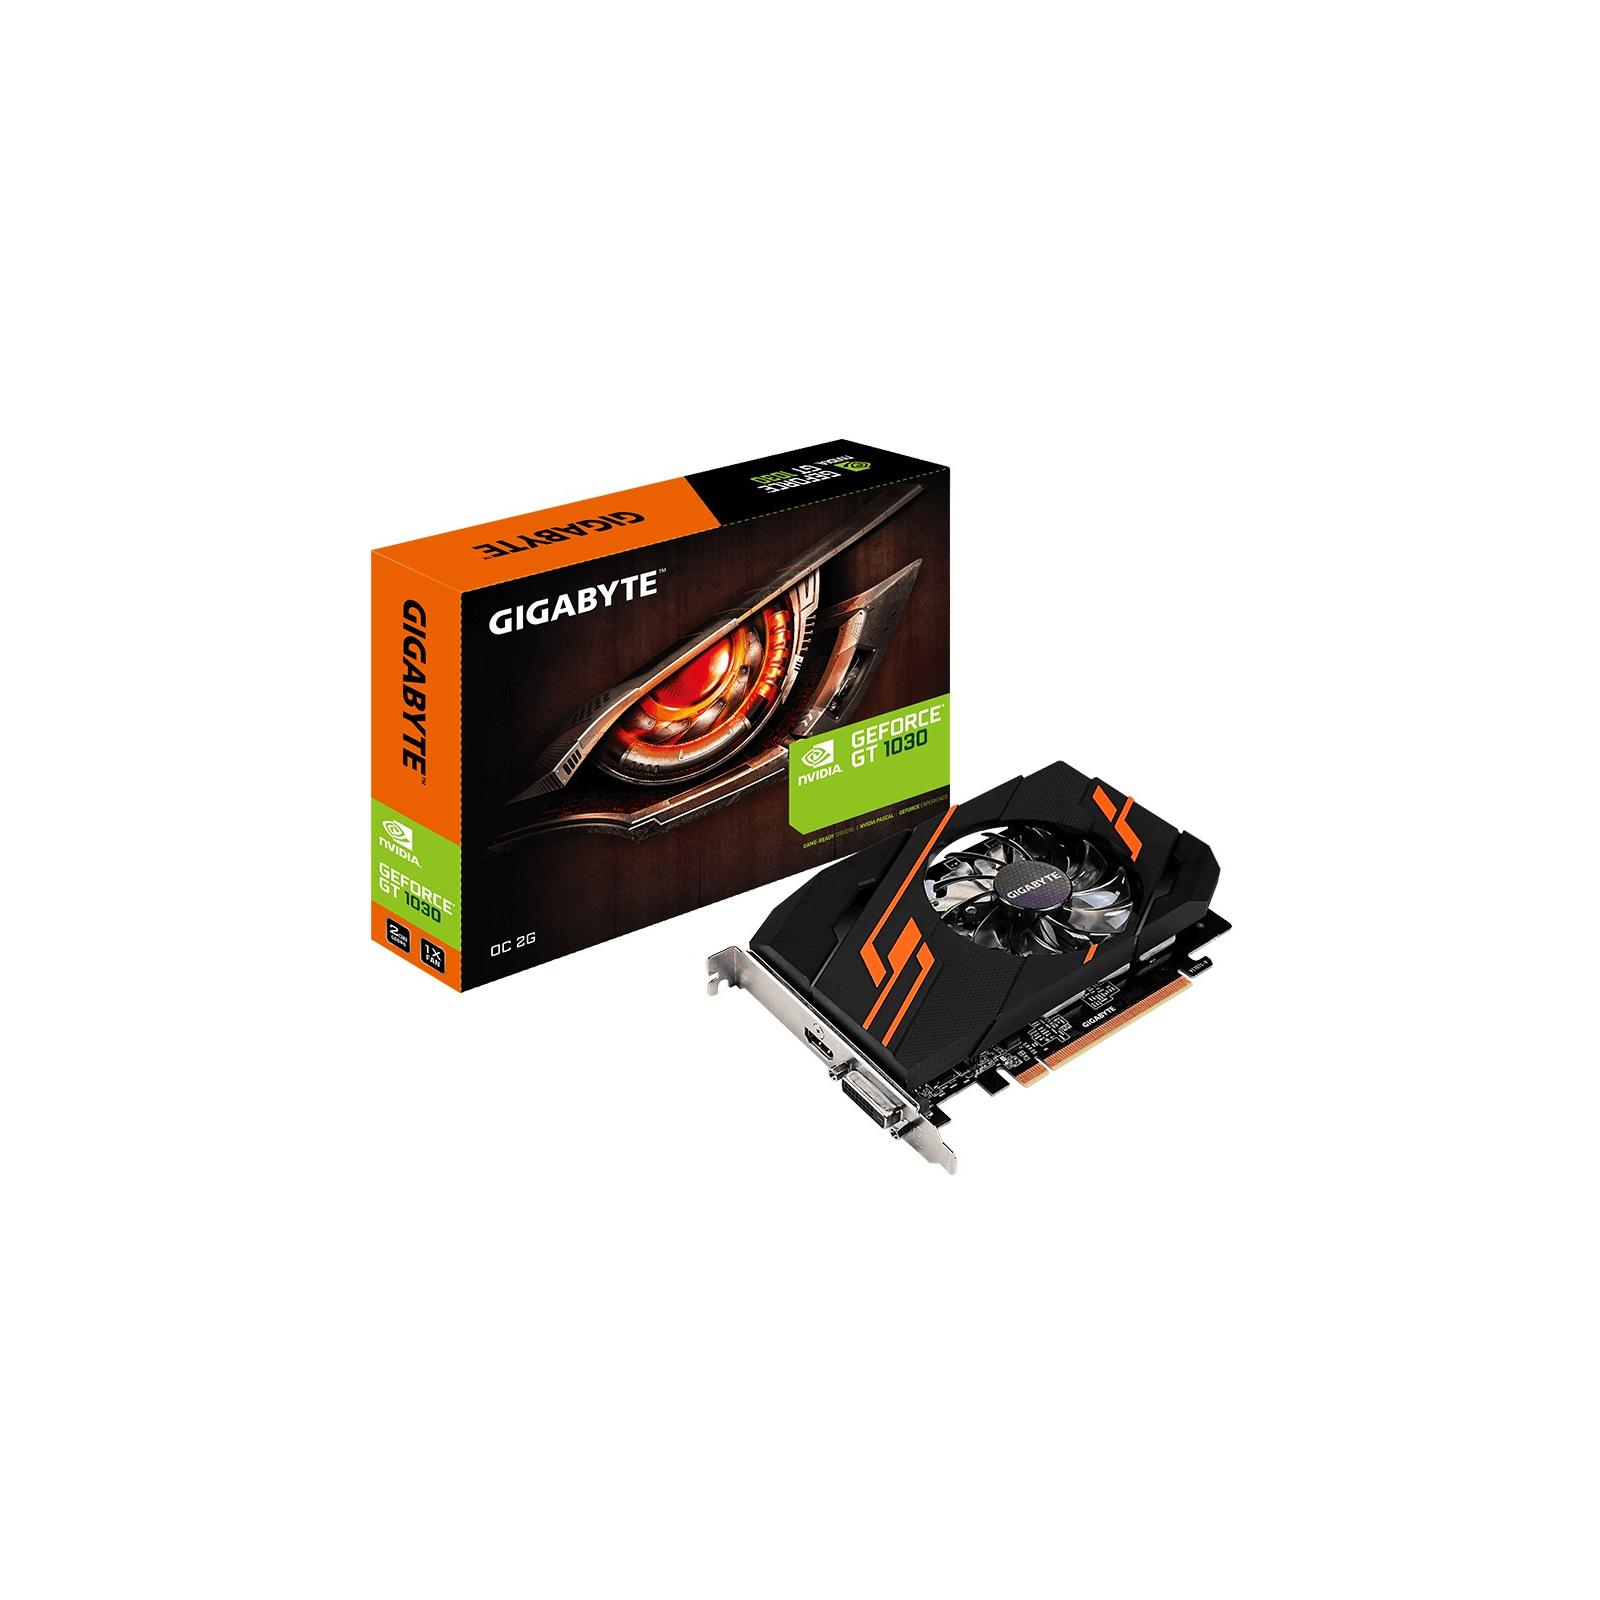 Відеокарта GIGABYTE GeForce GT1030 2048Mb OC (GV-N1030OC-2GI)